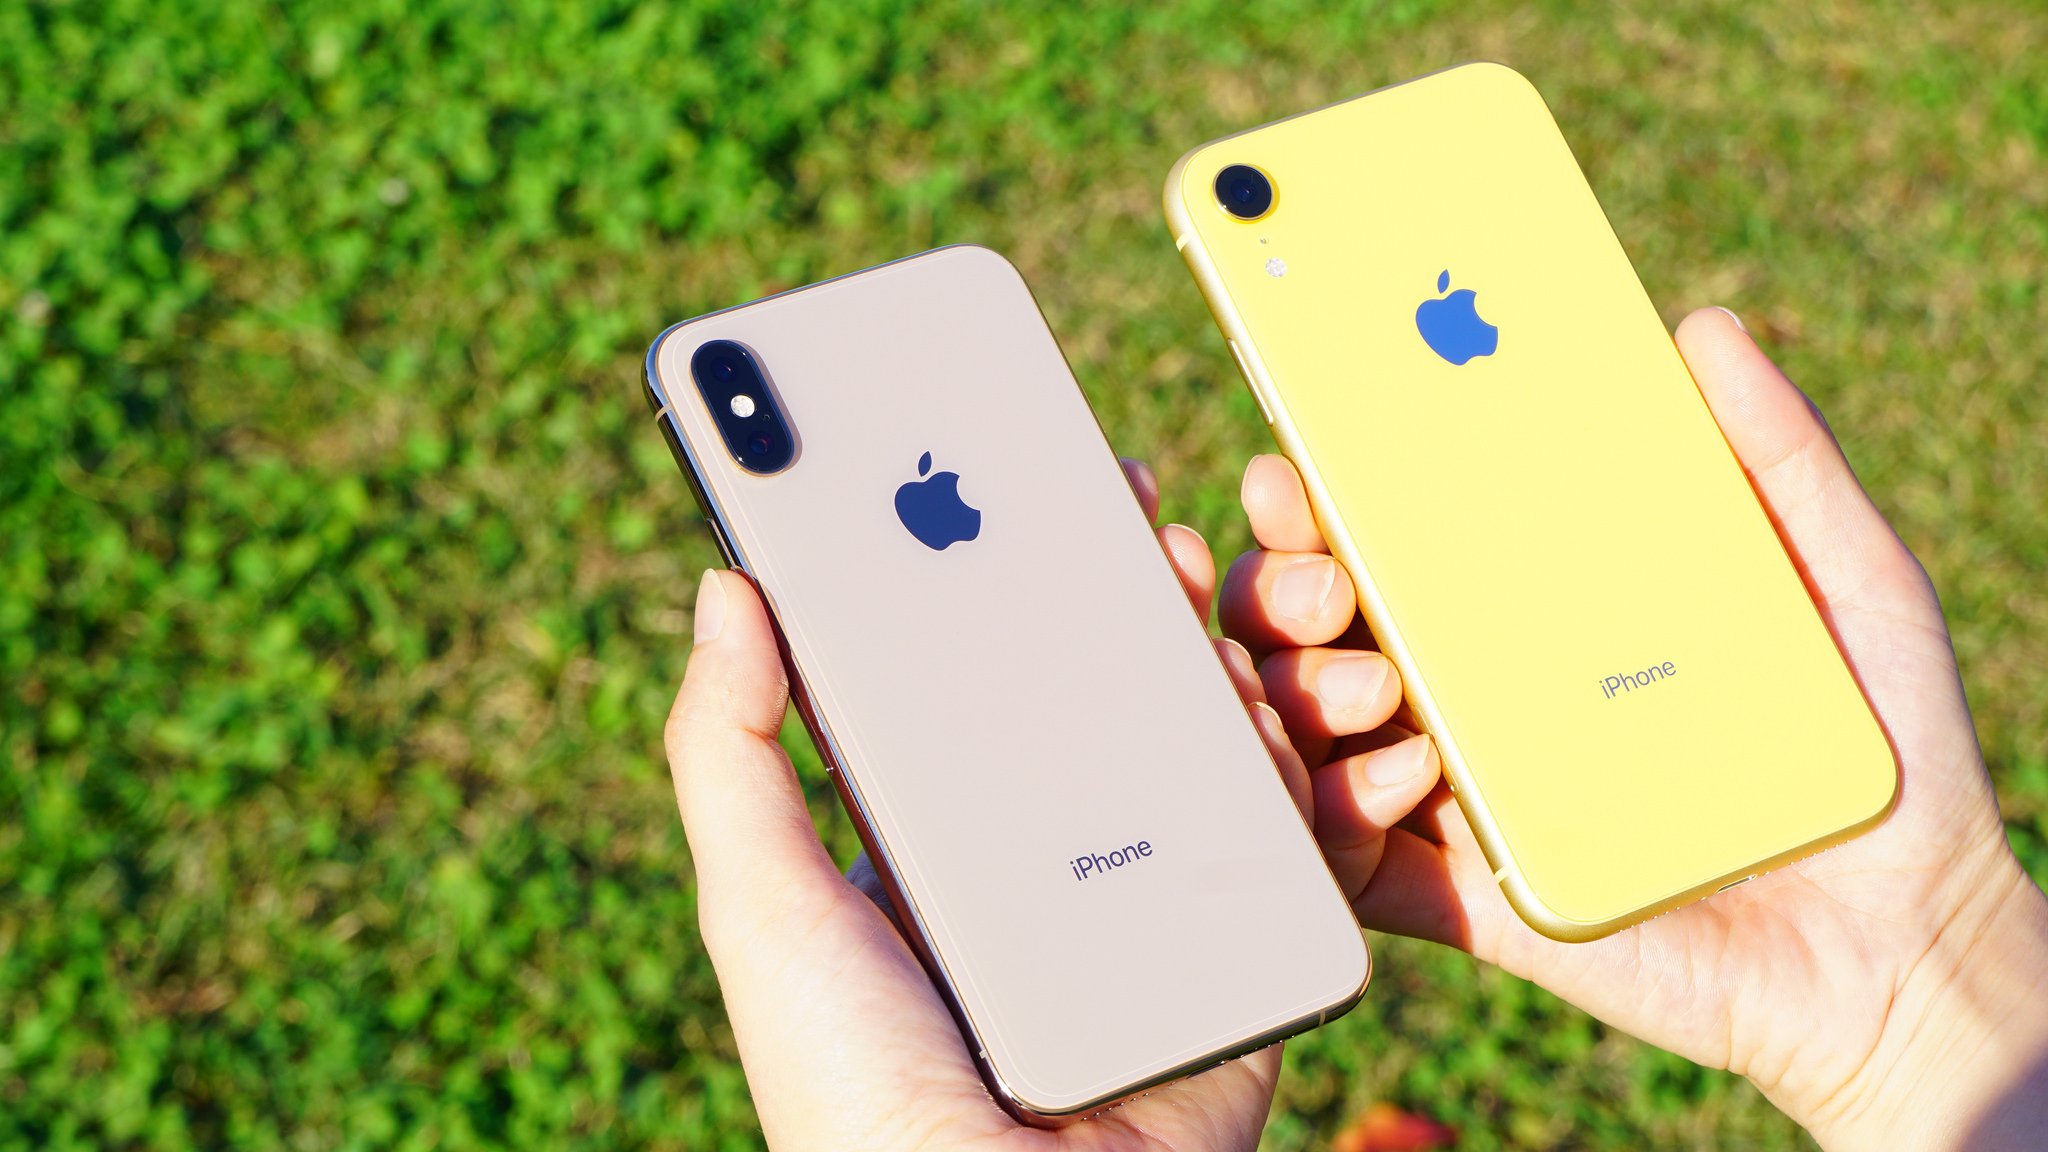 iPhone XS/XS Max/XR、3割が高いと感じるも購入意向トップに〜スマホ意識調査